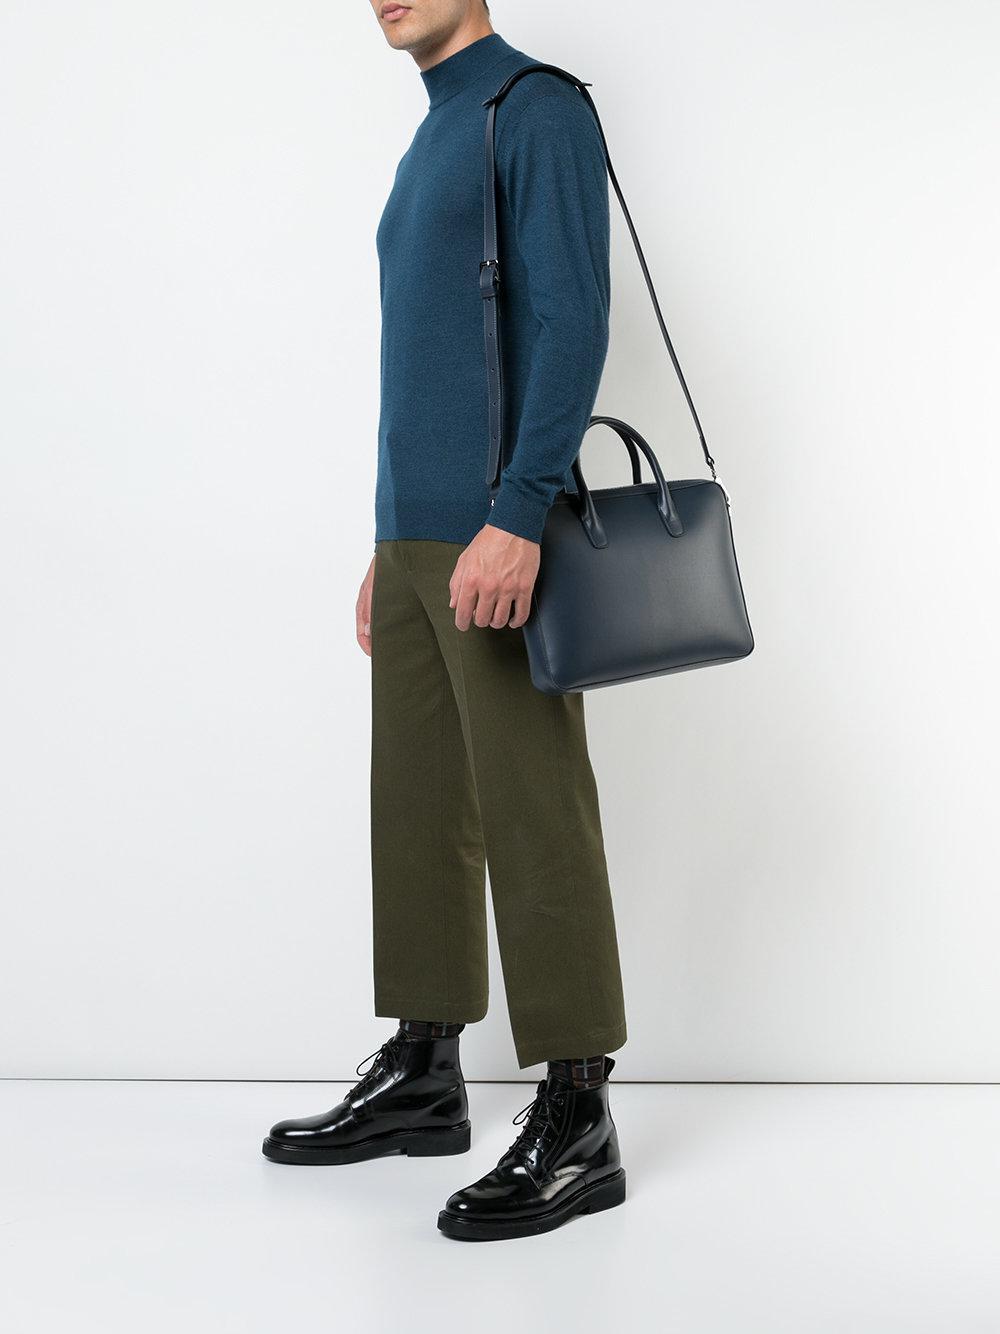 075430e59 Mansur Gavriel - Blue Small Briefcase Bag for Men - Lyst. View fullscreen